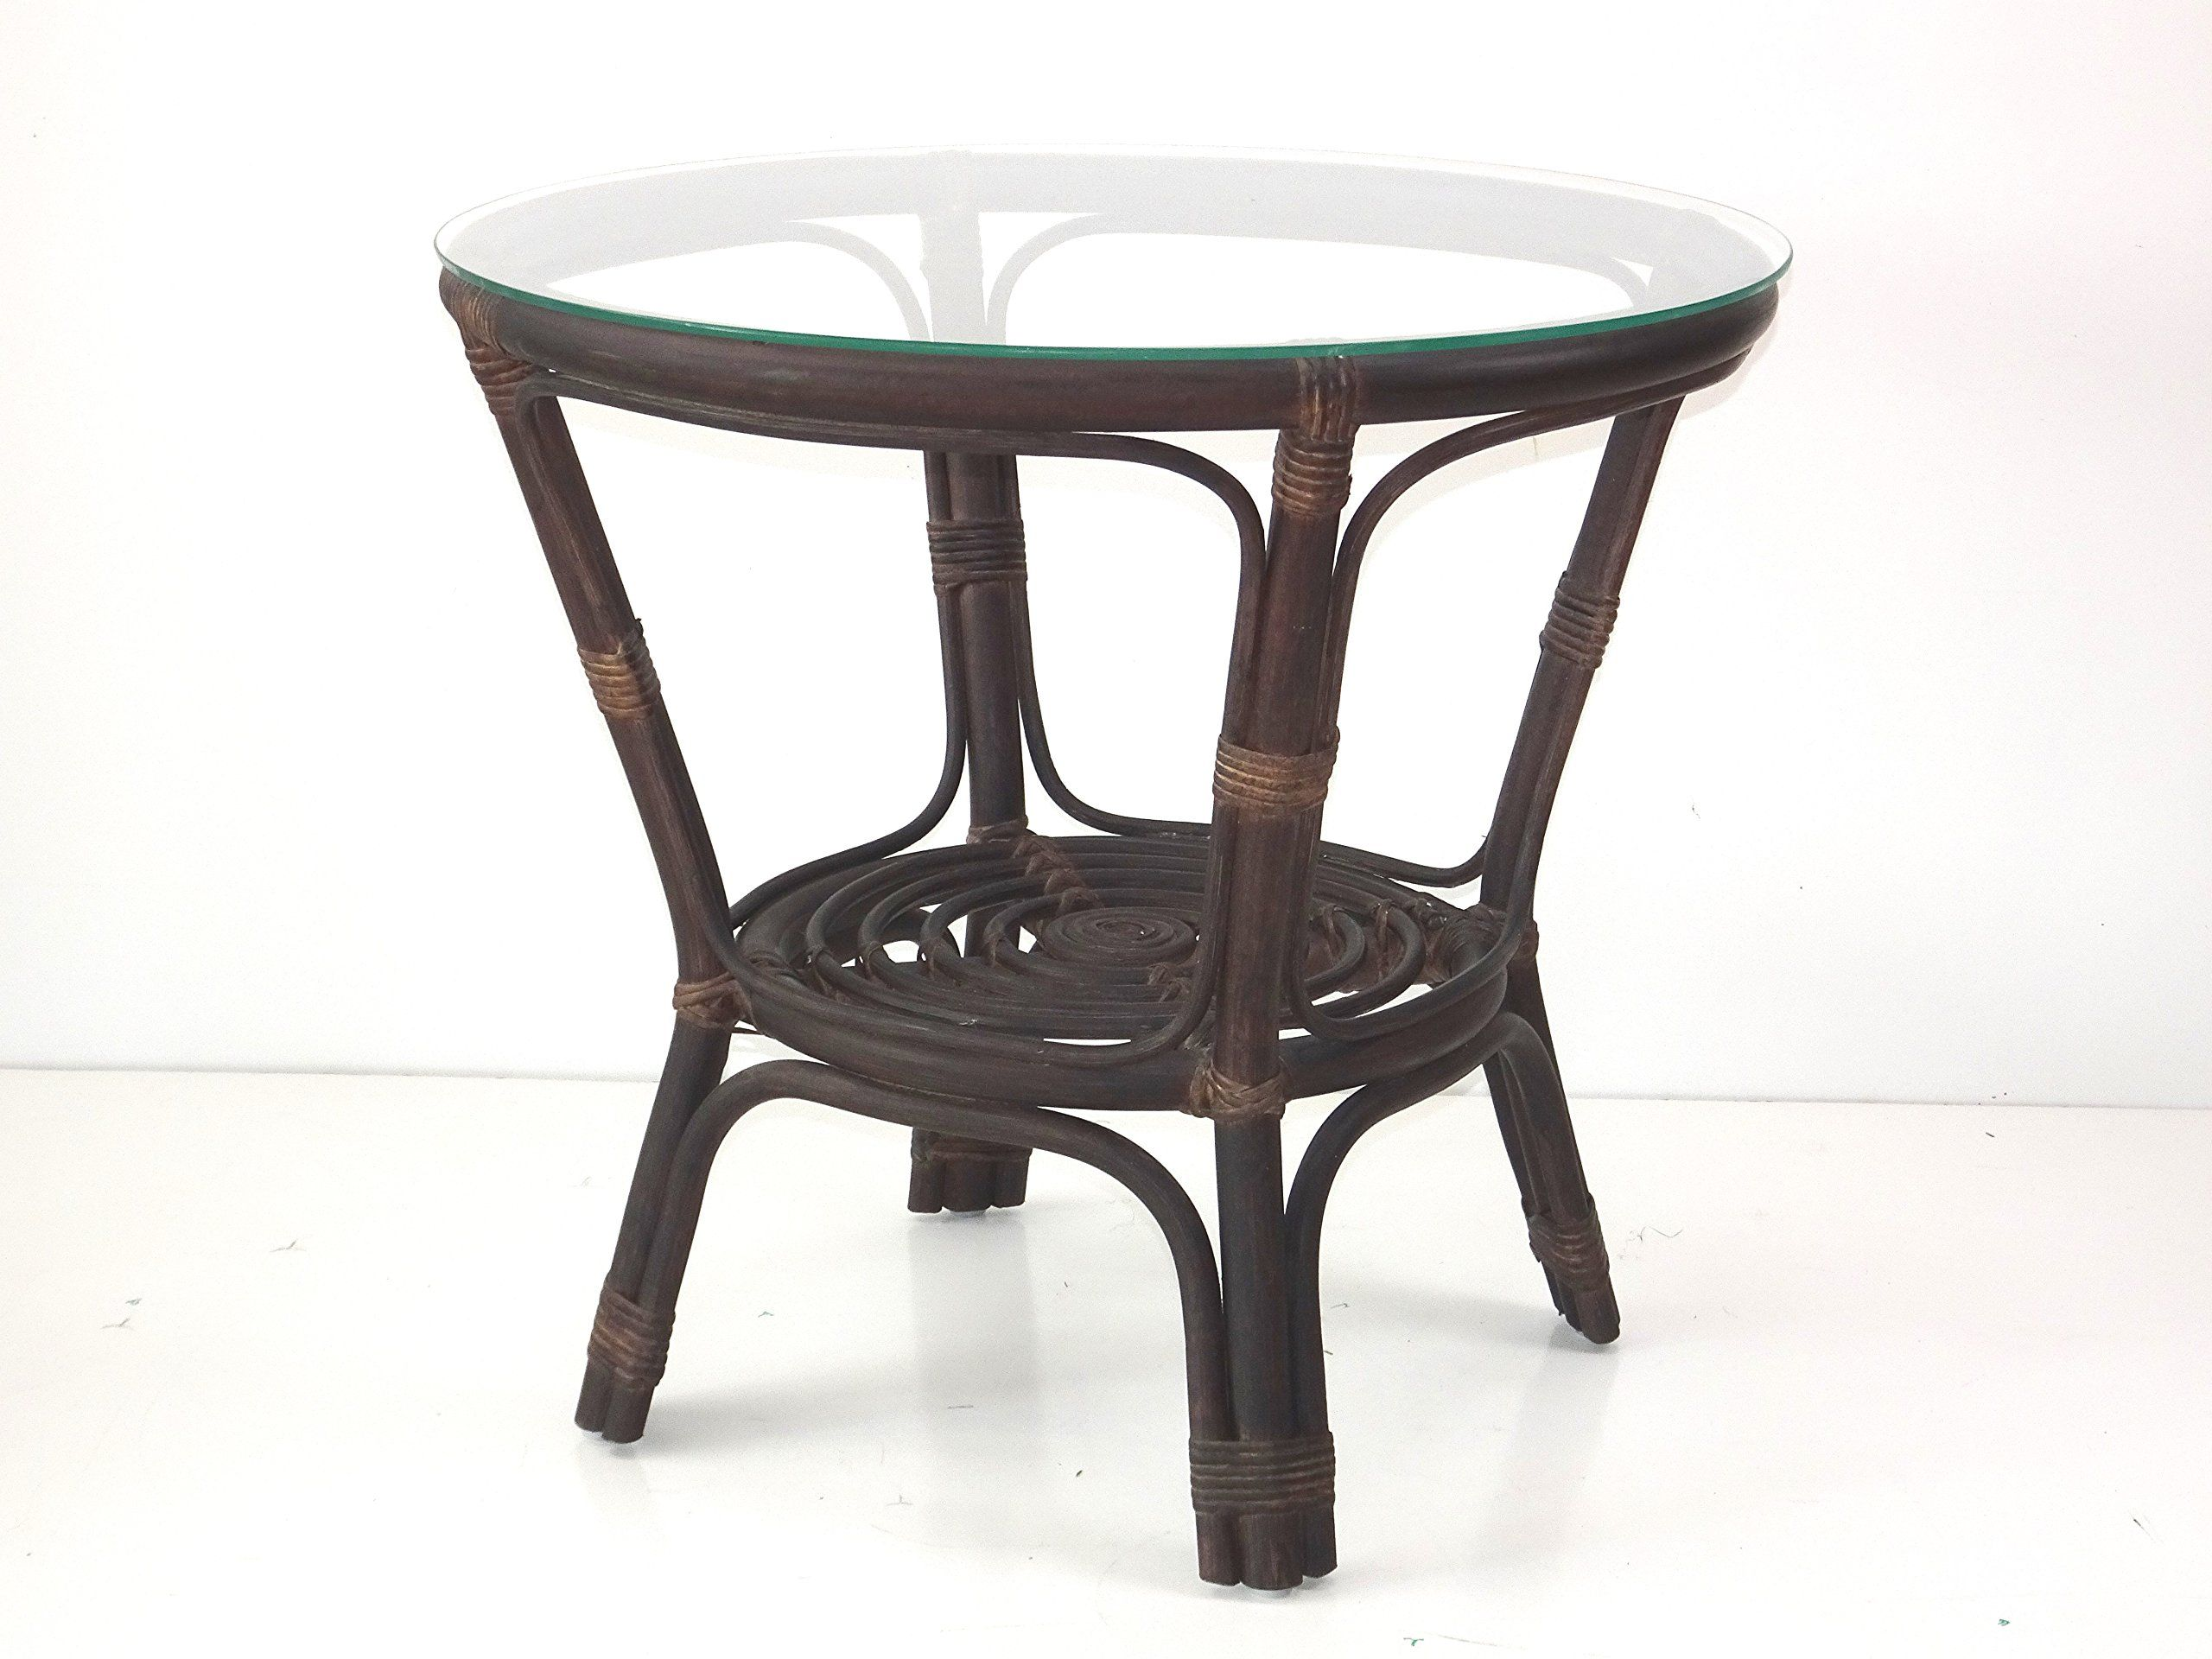 Bahama round coffee table w glass top wicker eco rattan